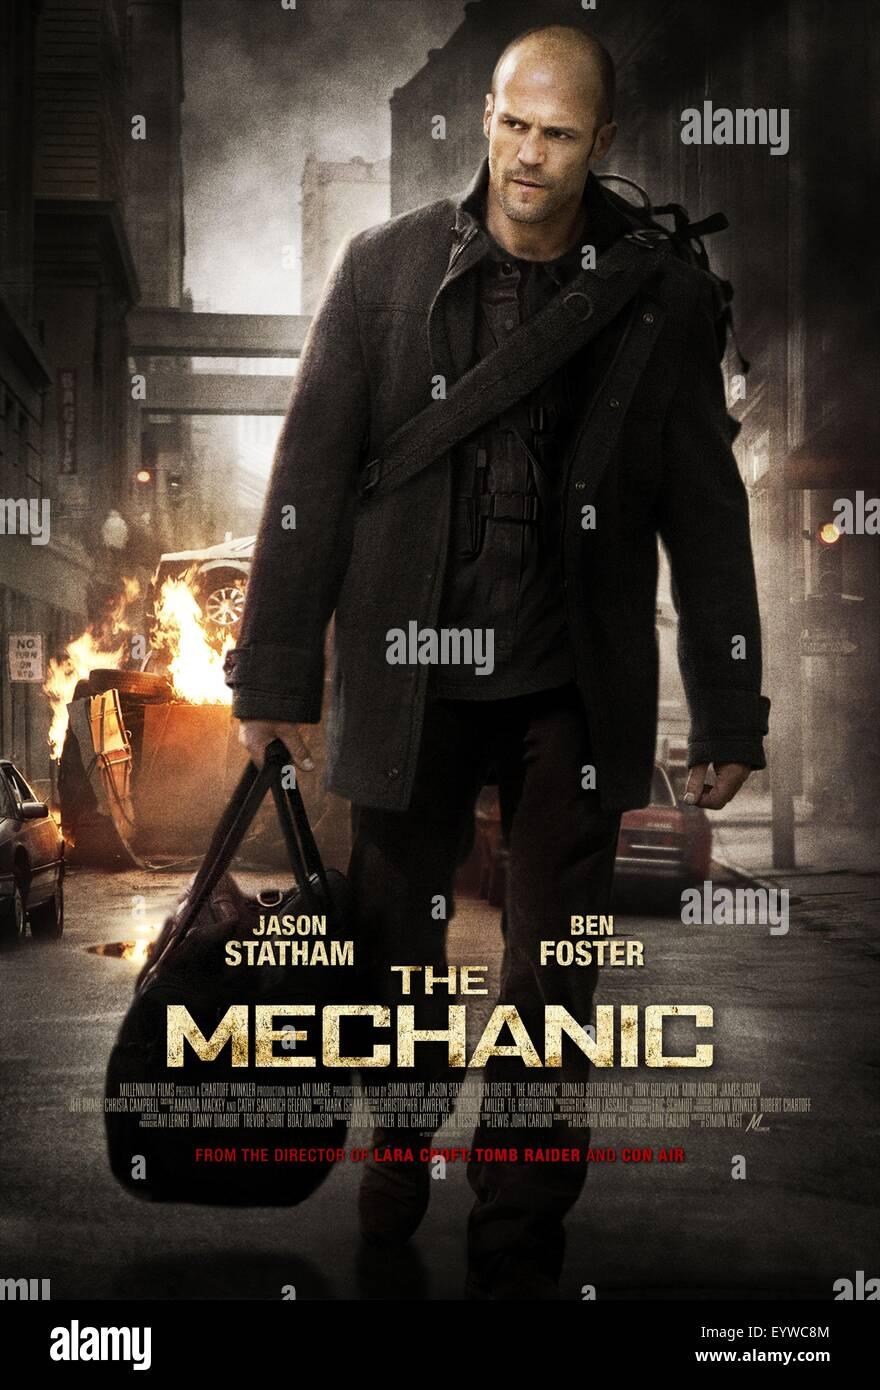 The Mechanic ; Year : 2011 USA ; Director : Simon West ; Jason Statham ; Movie poster (USA) Stock Photo